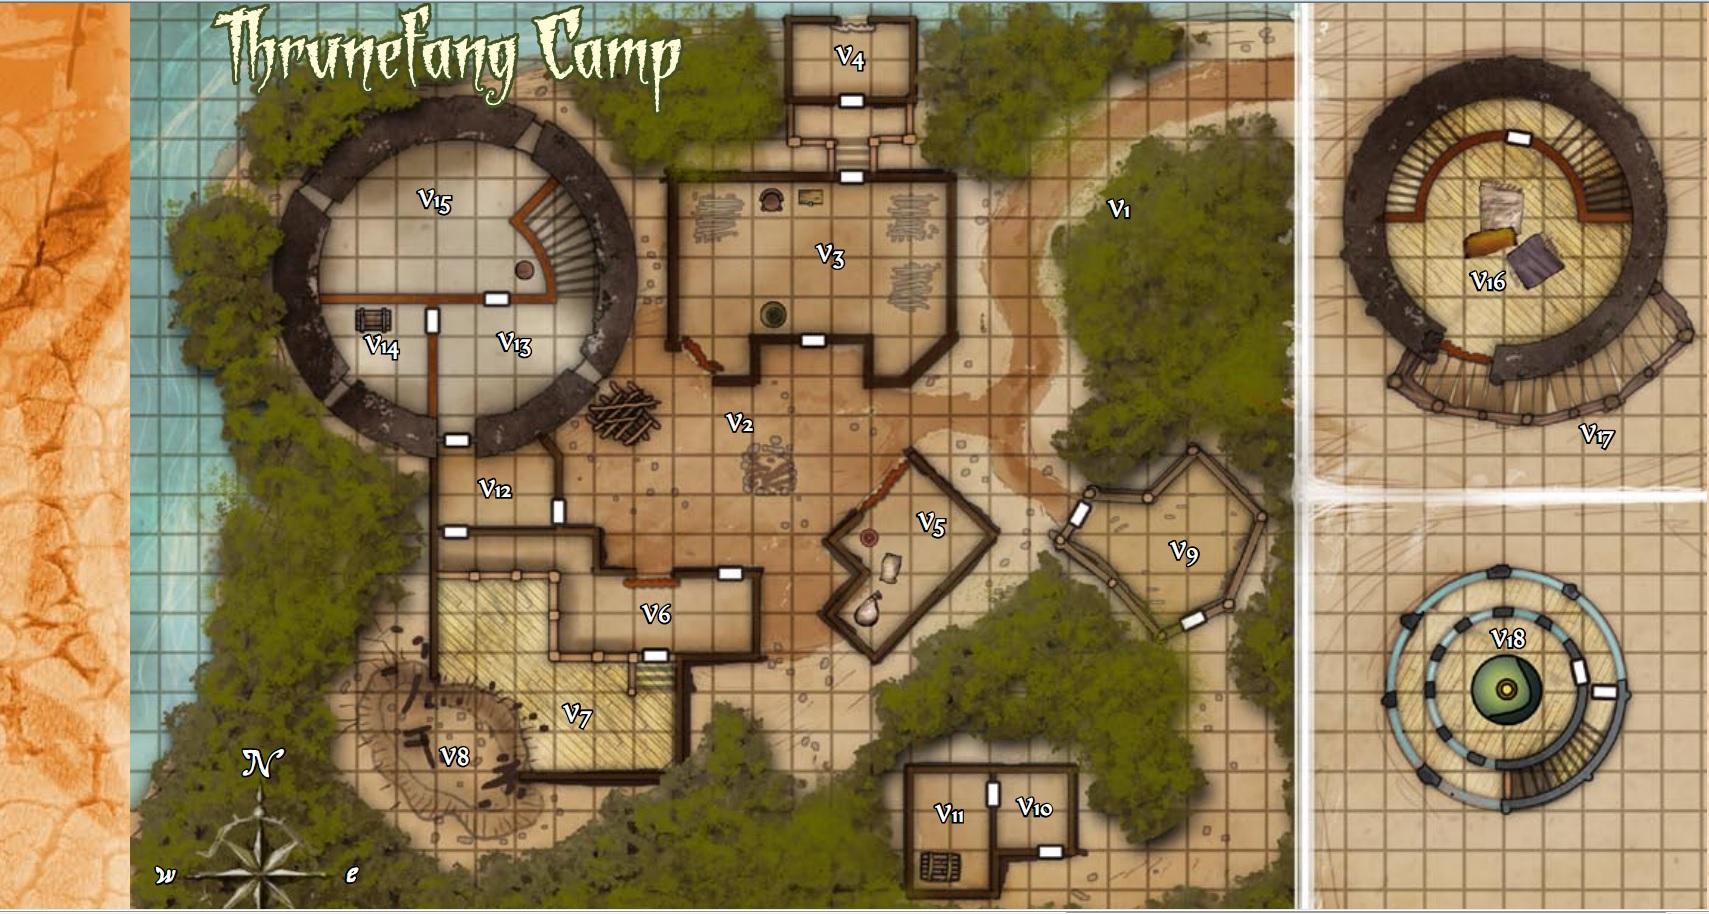 Cannibal camp